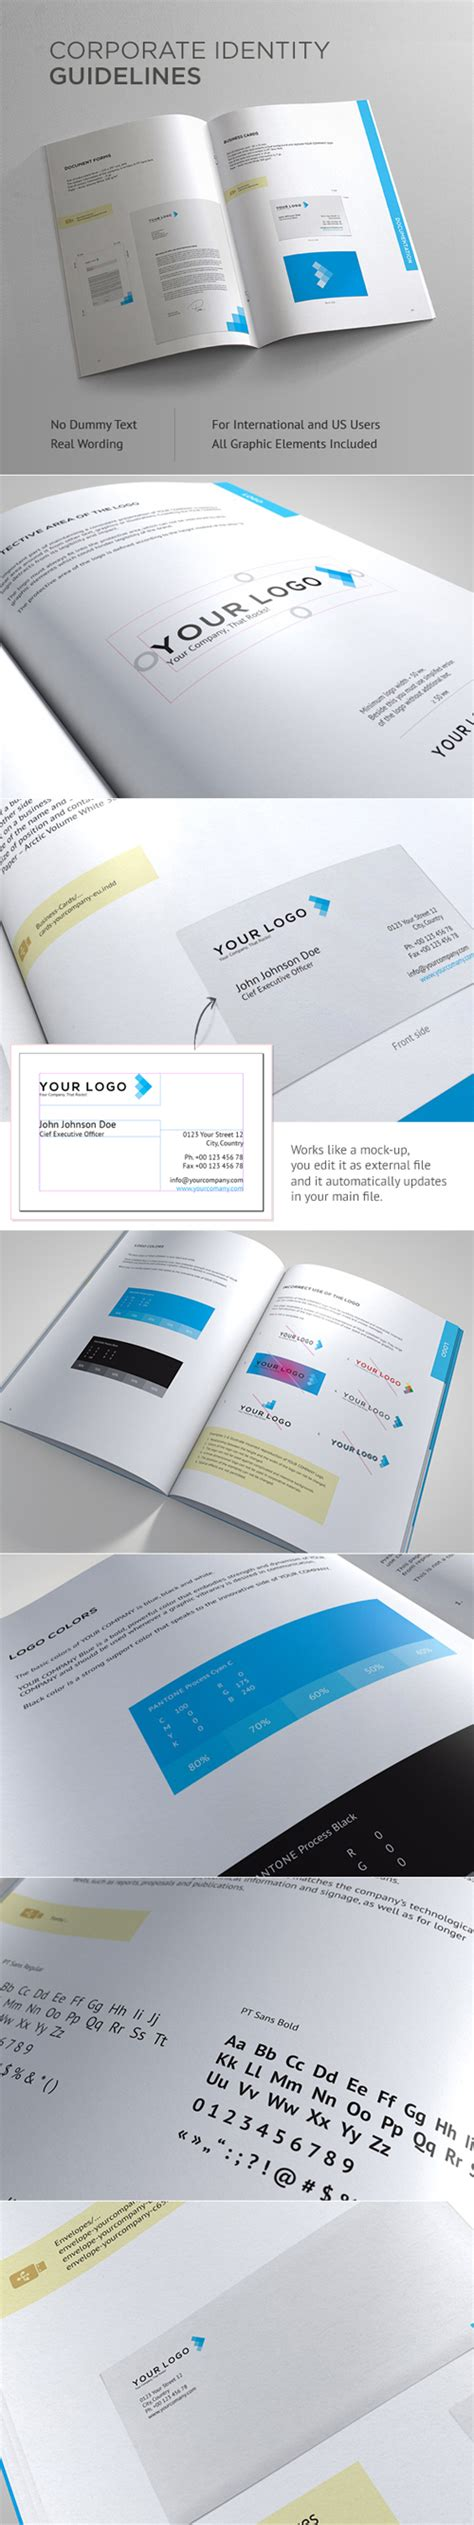 brochure layout guidelines professional brochure designs graphics design design blog